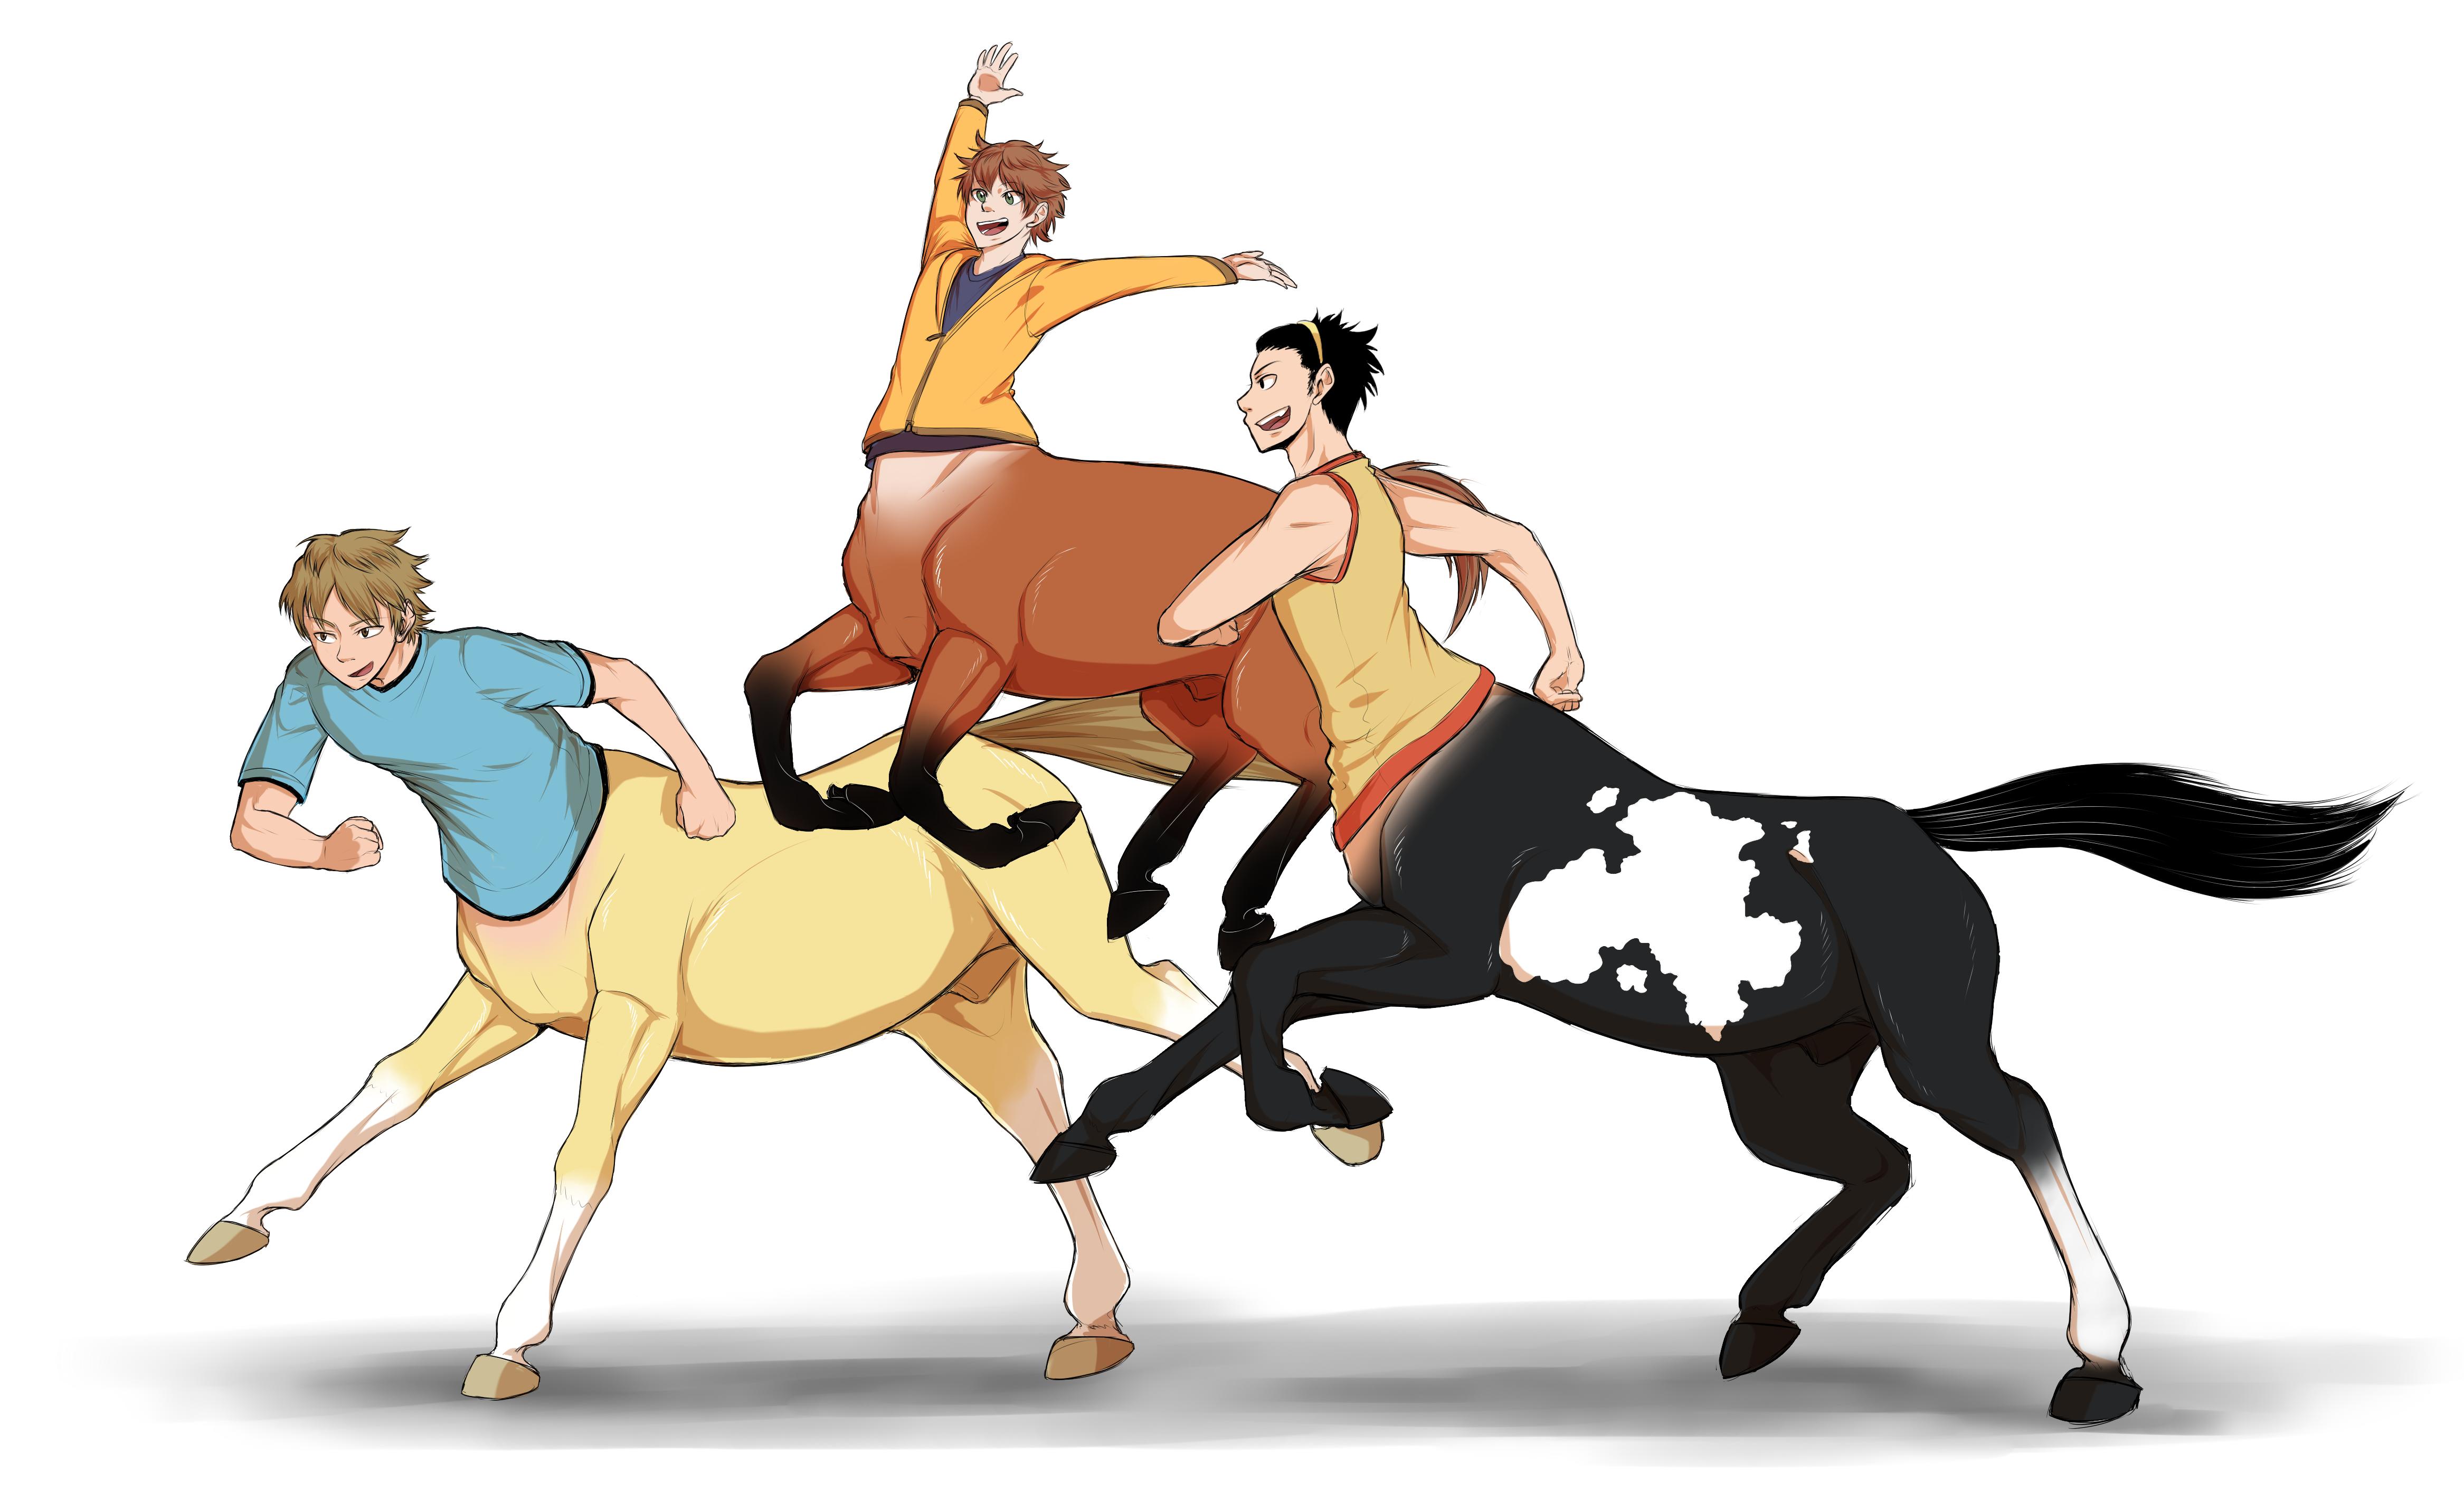 Baka Trio Centaurs by Abby-desu on DeviantArt